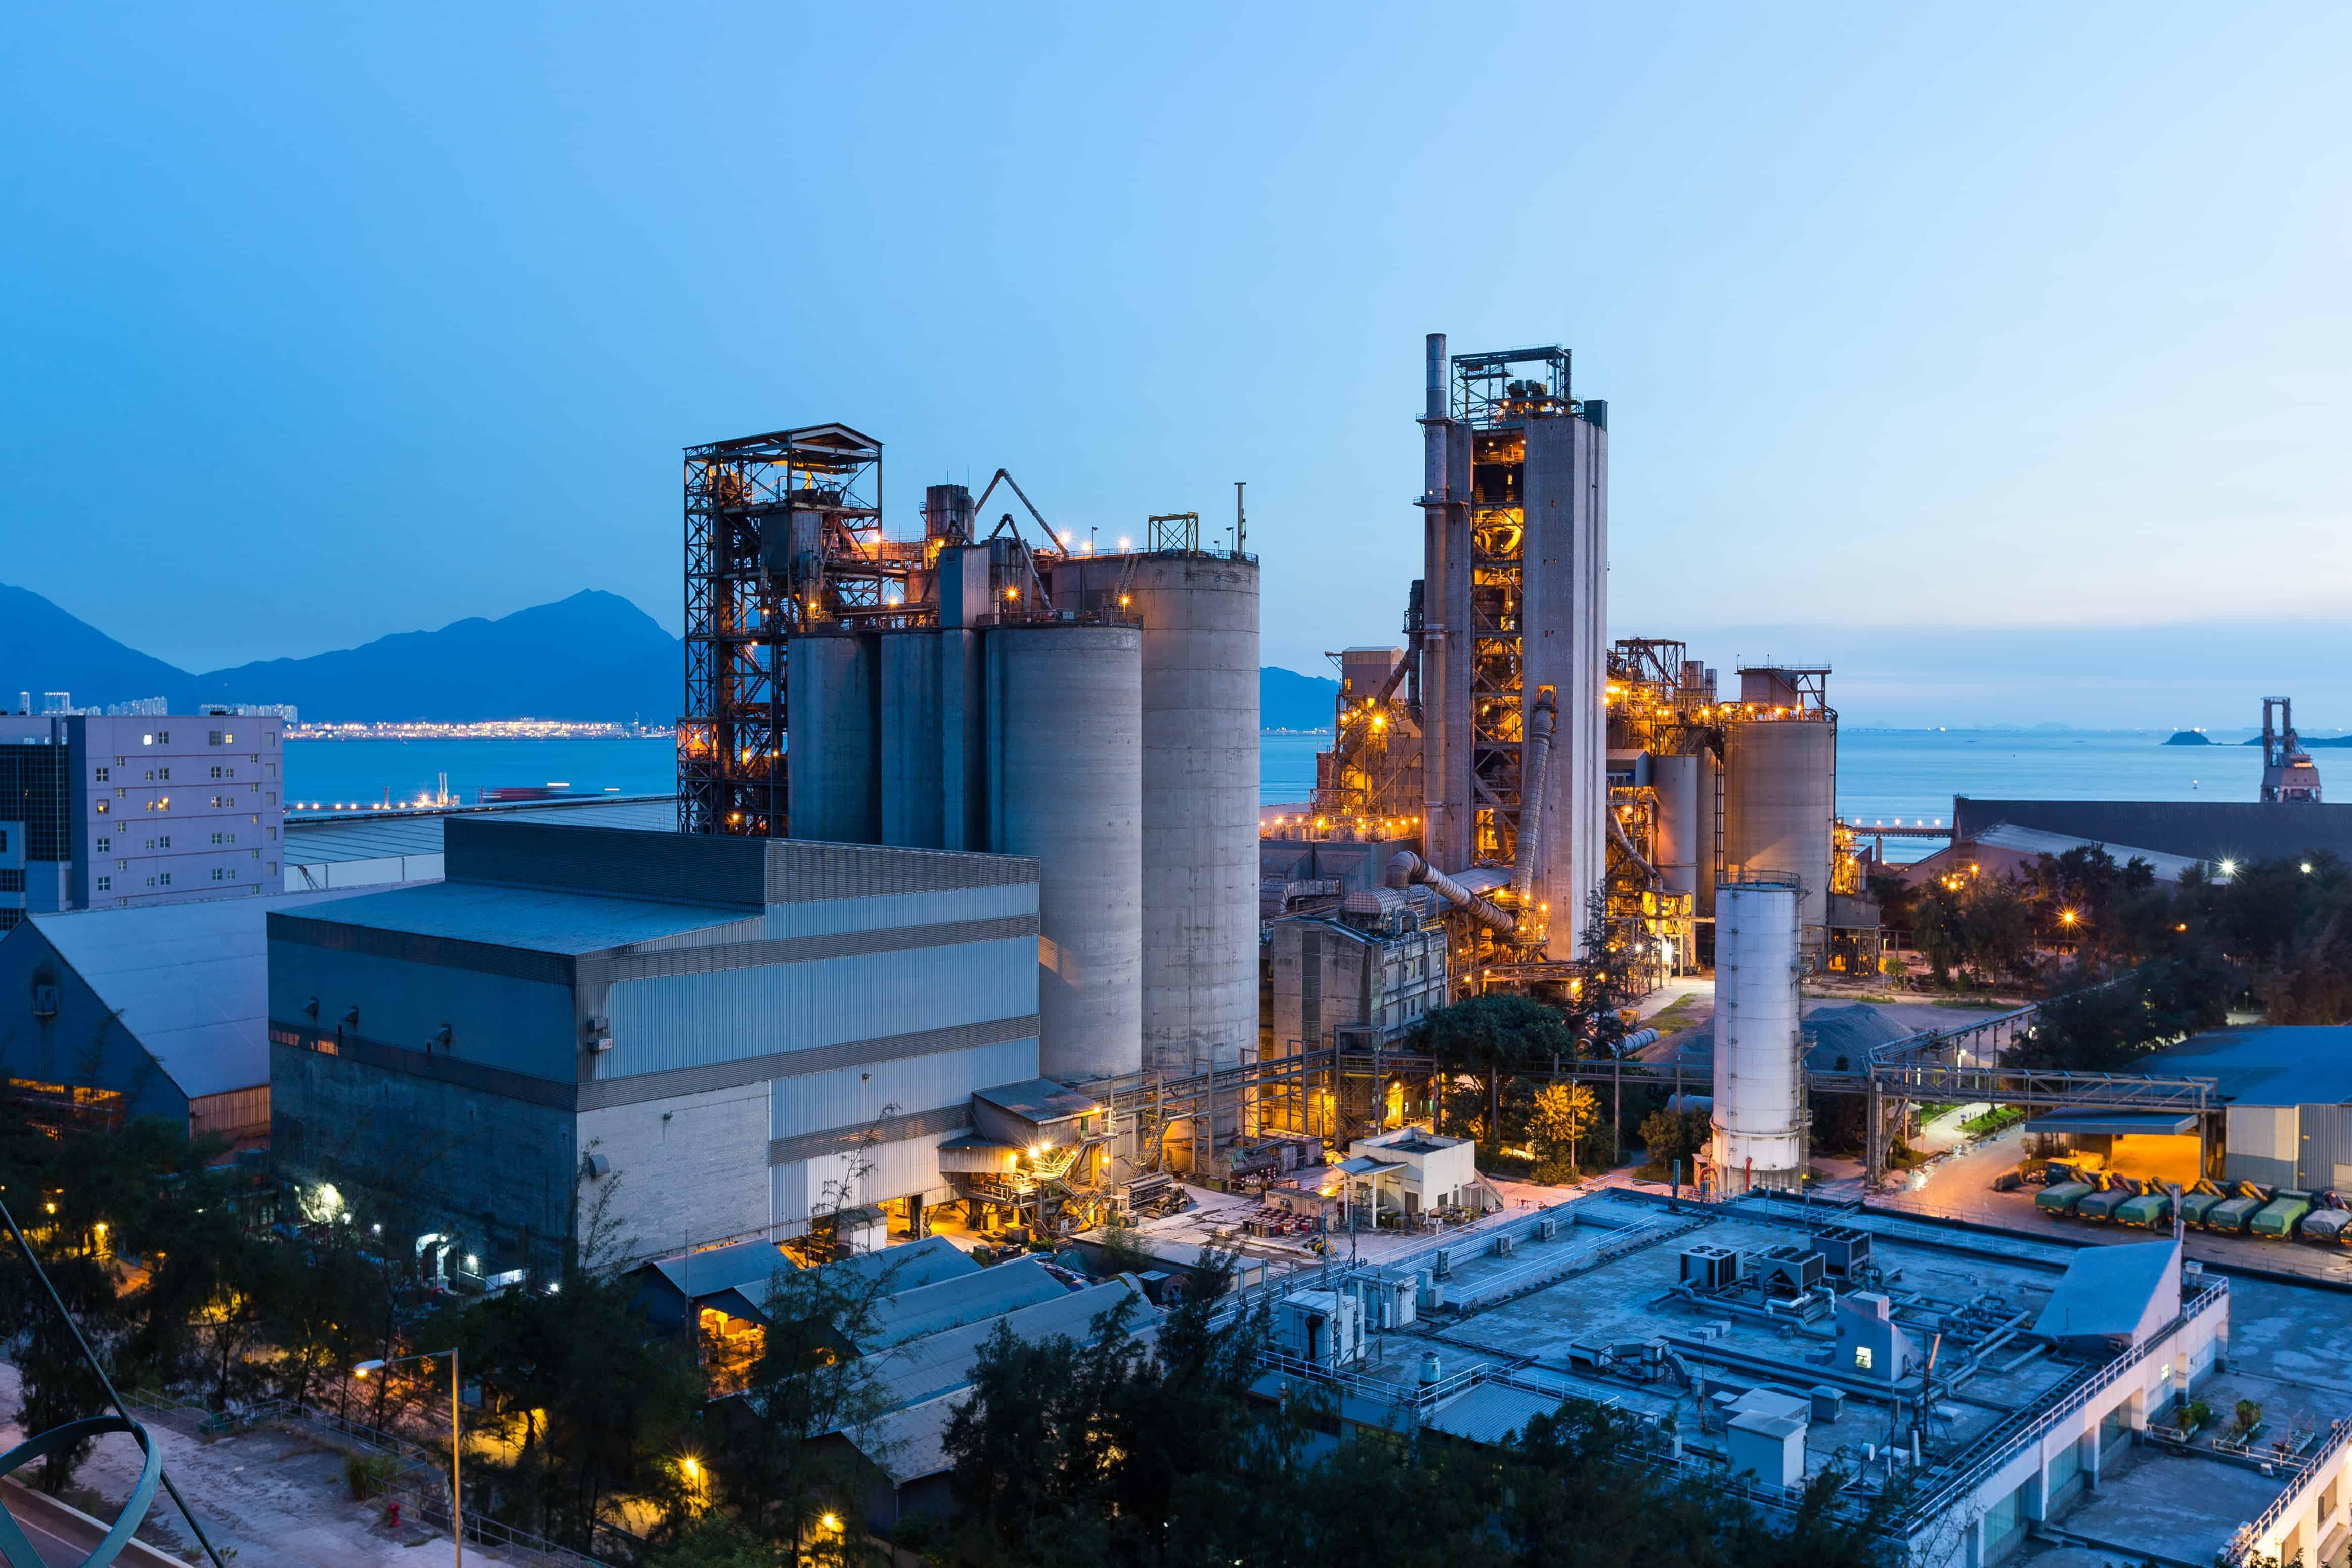 Krytox & Lubricants - Miller-Stephenson Chemicals